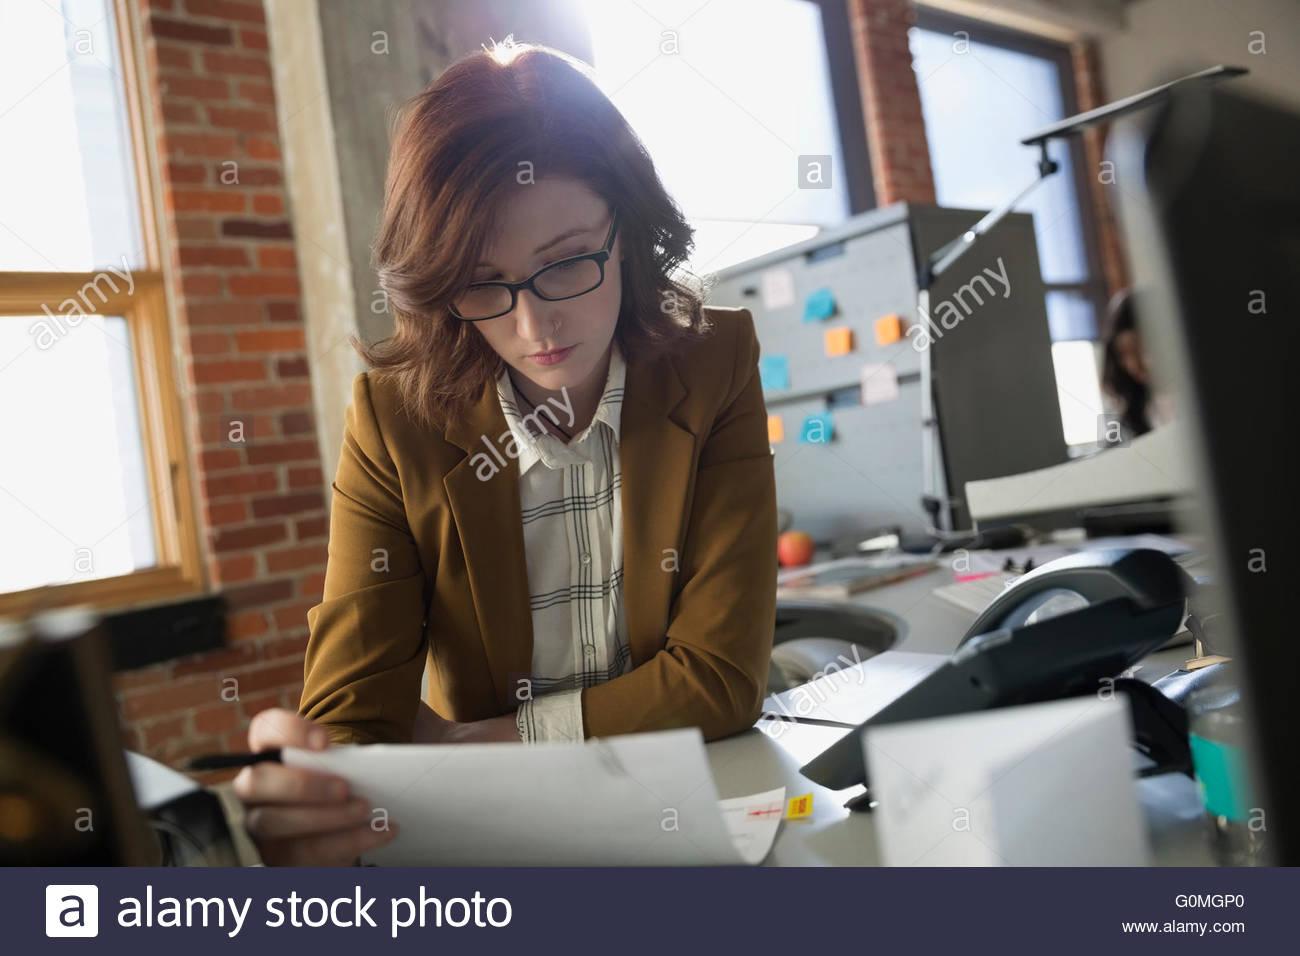 Se centró la empresaria leer el papeleo a la oficina Imagen De Stock